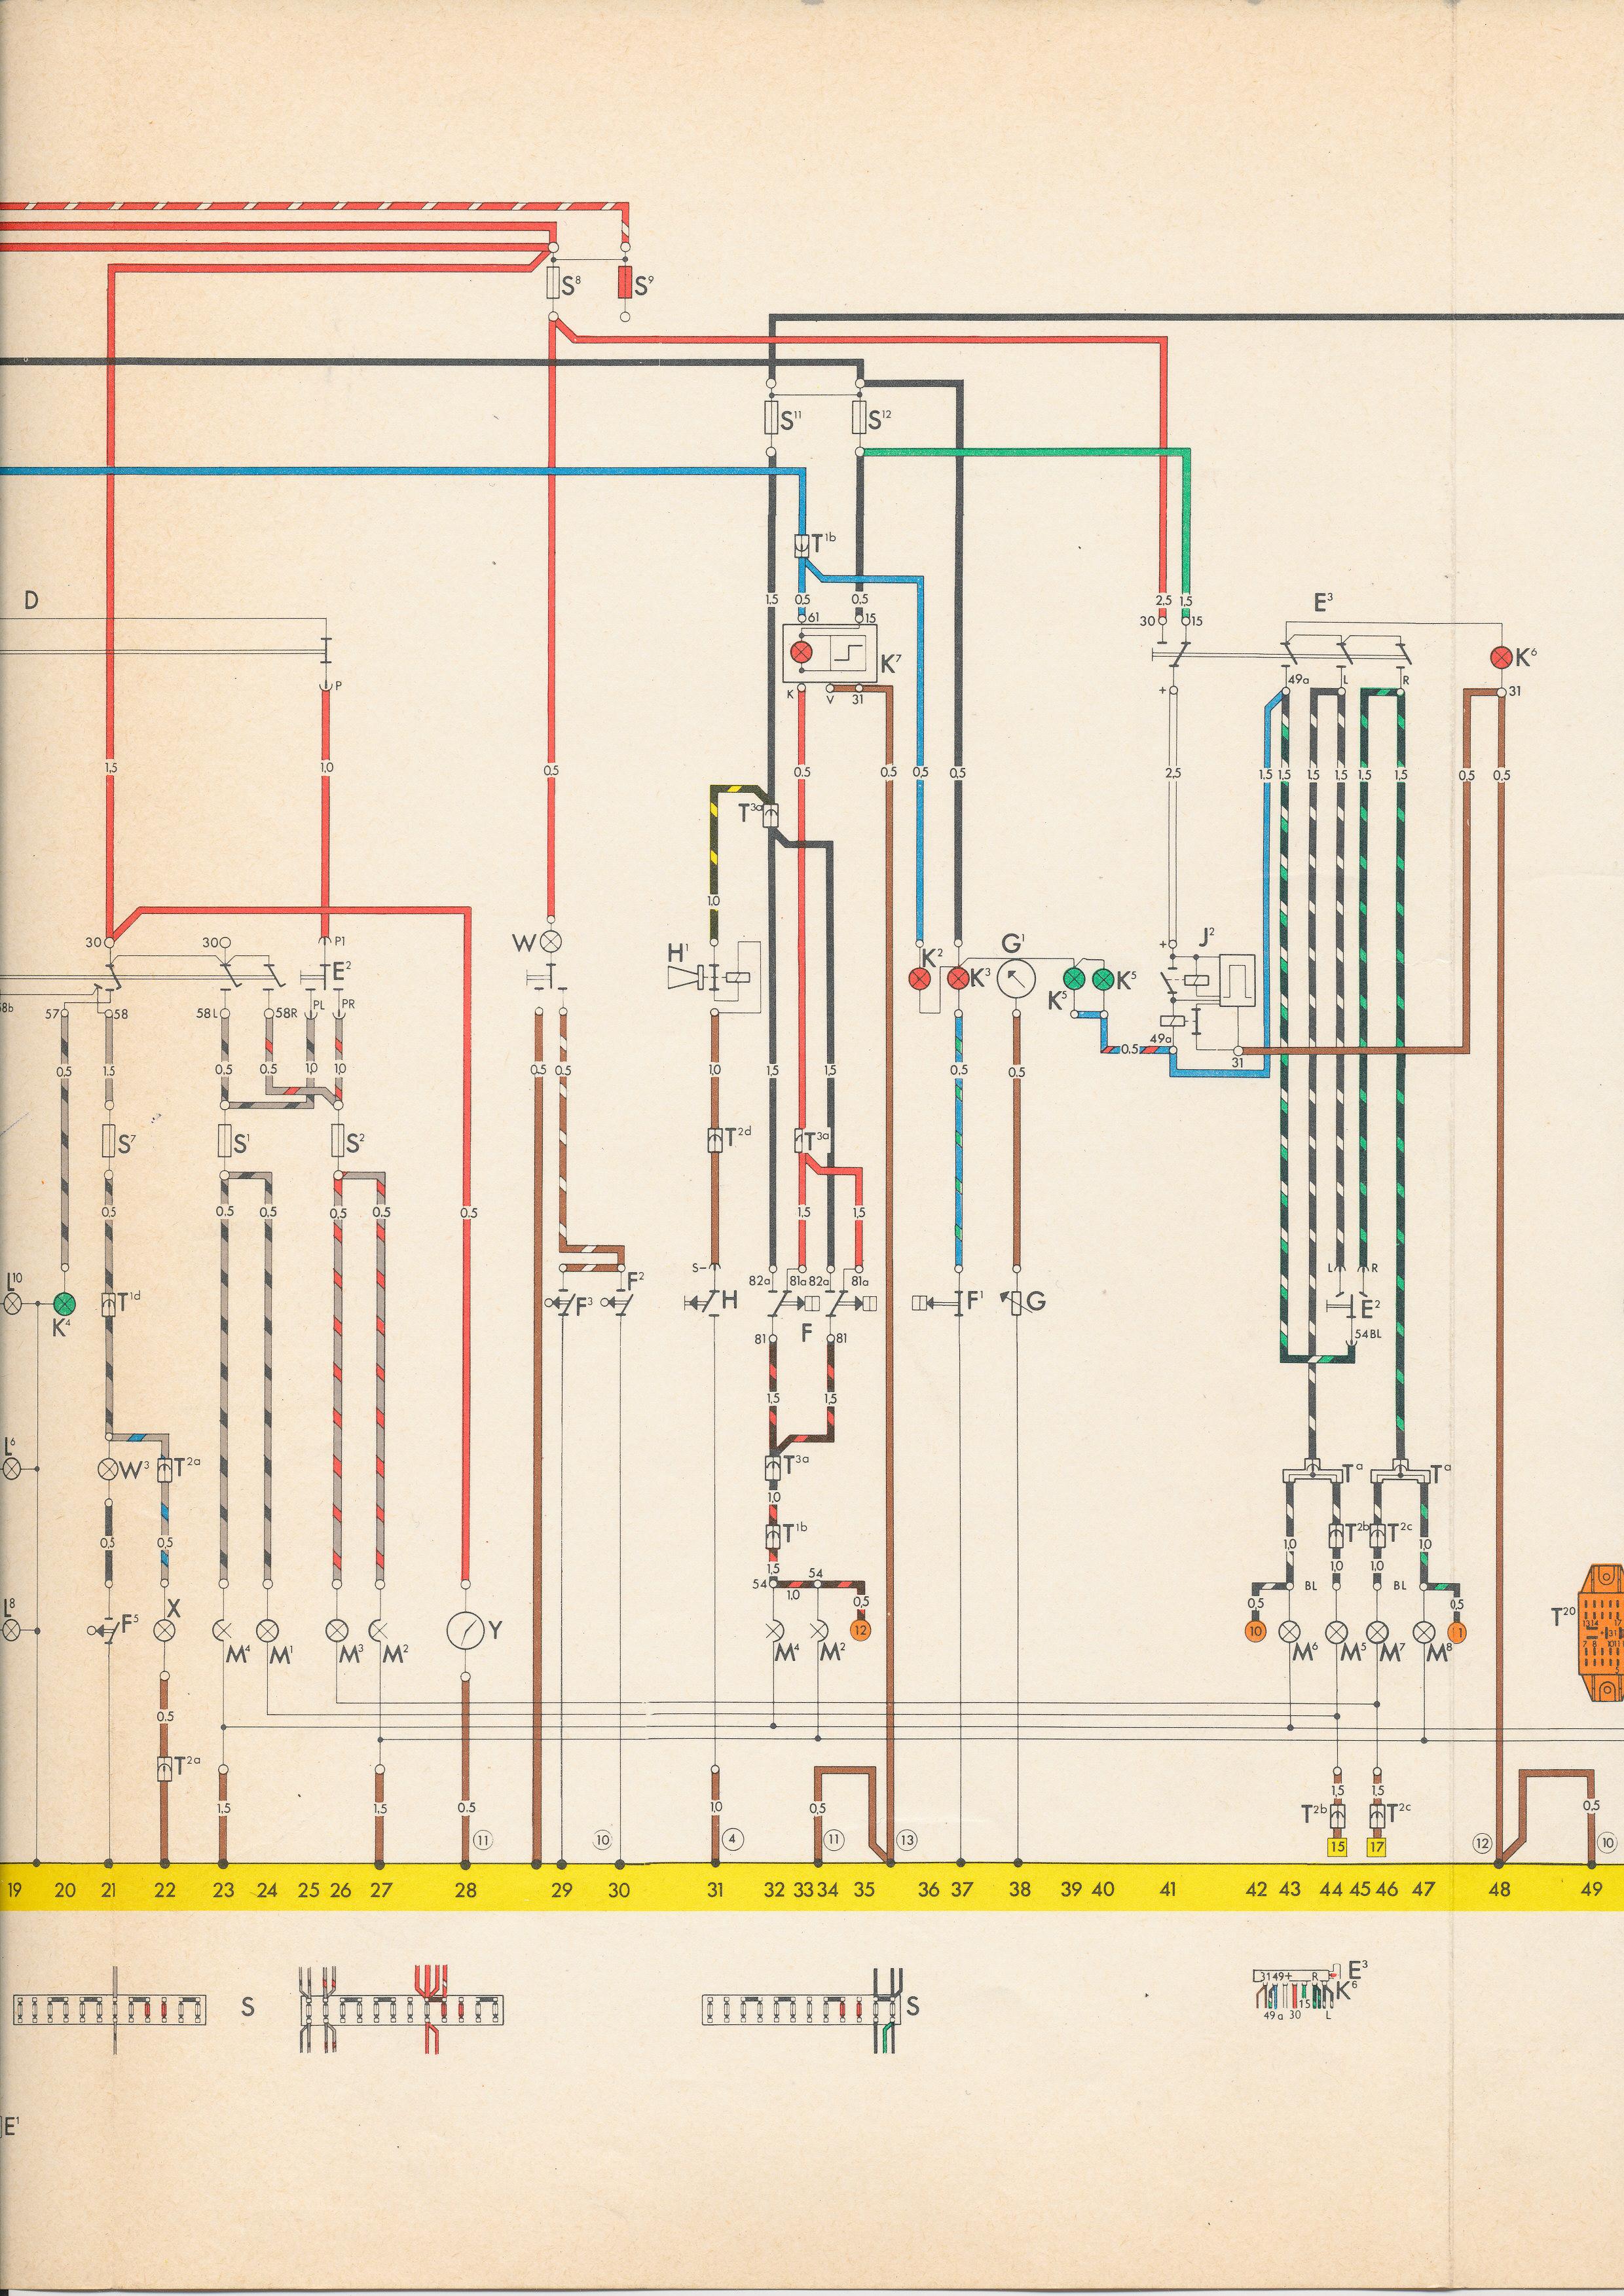 Beetle Fuse Box Diagram Thesamba Com Type 3 Wiring Diagrams